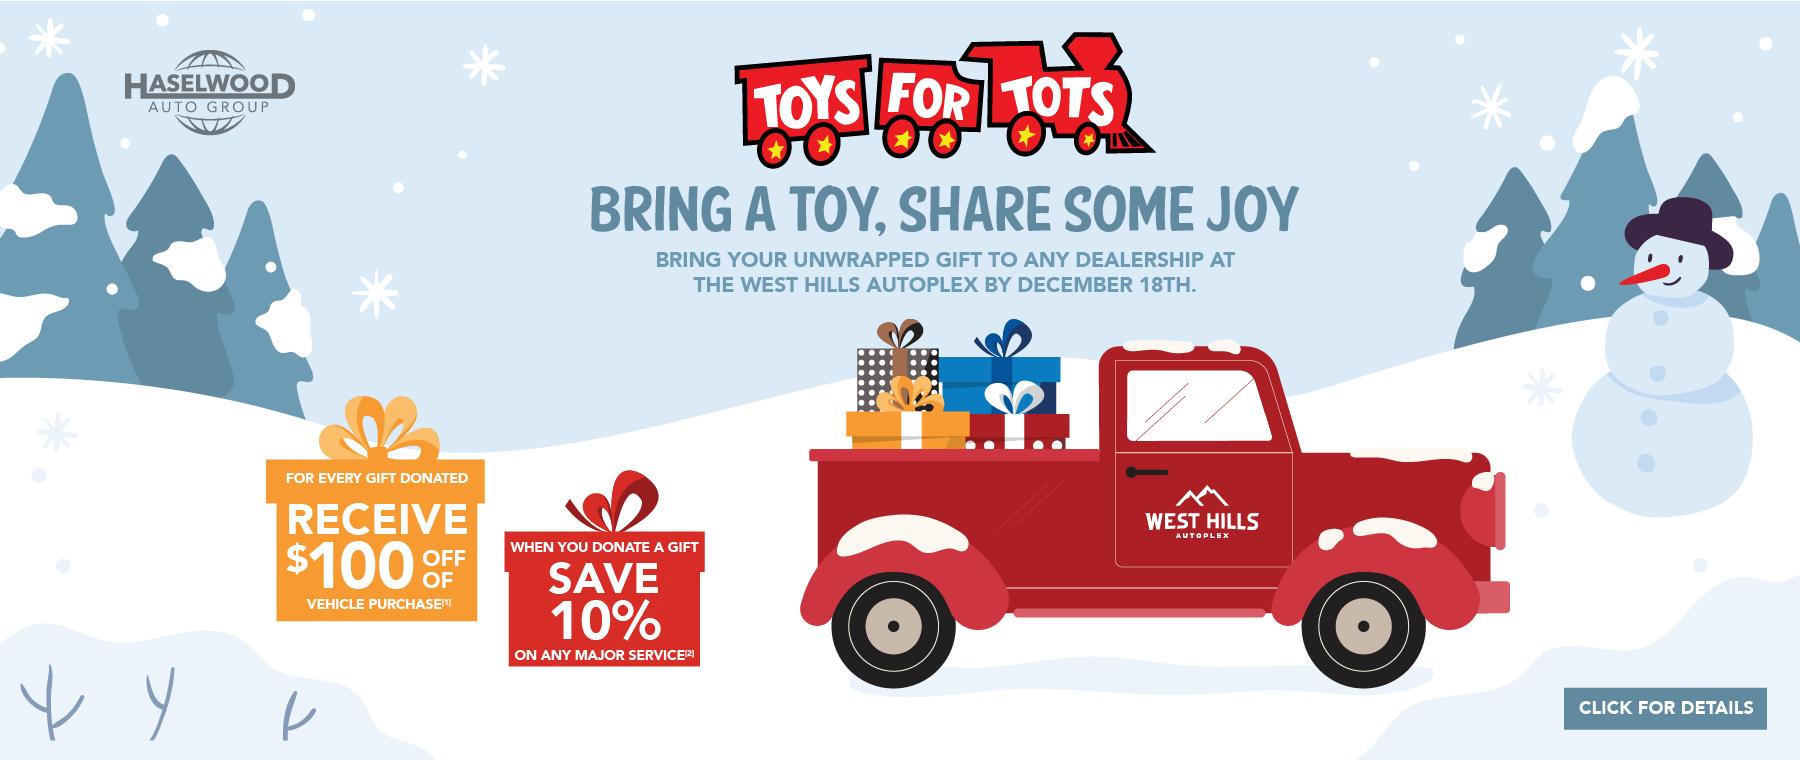 11731 – NOV20 – WHAP – Toys for Tots – Webslides_1800x760